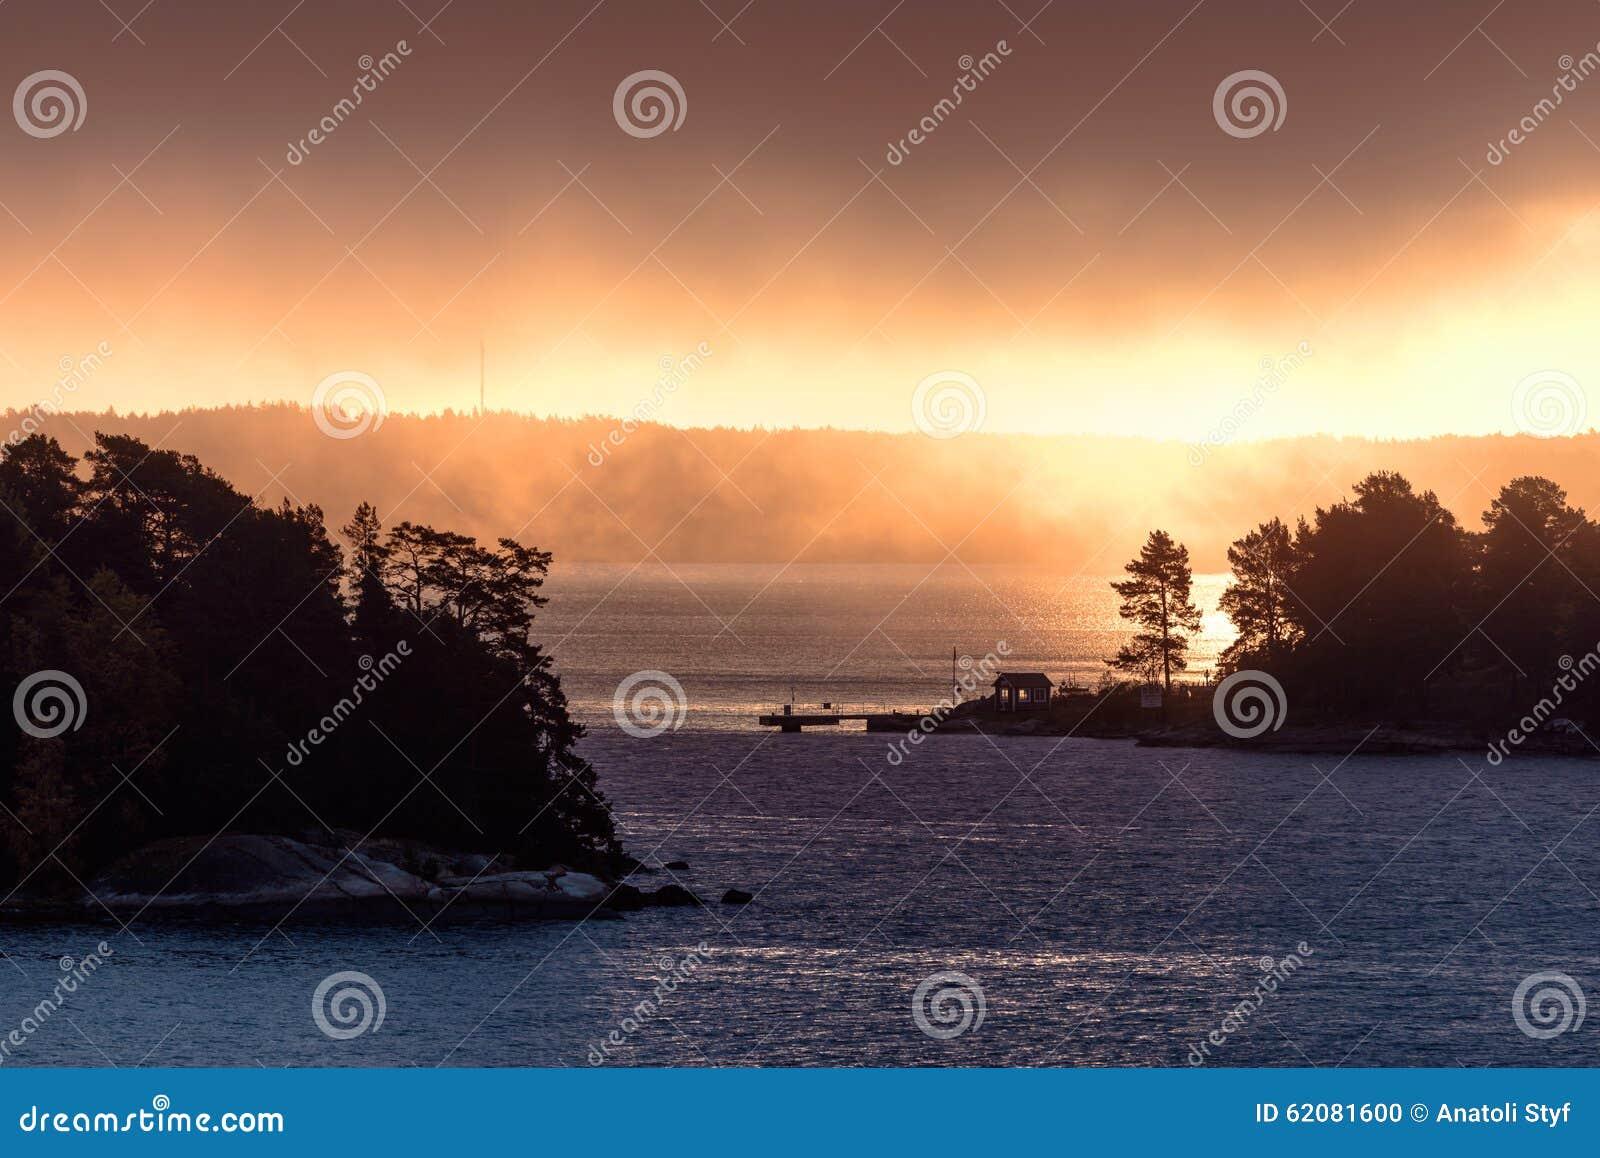 morning mist at sunrise stock photography